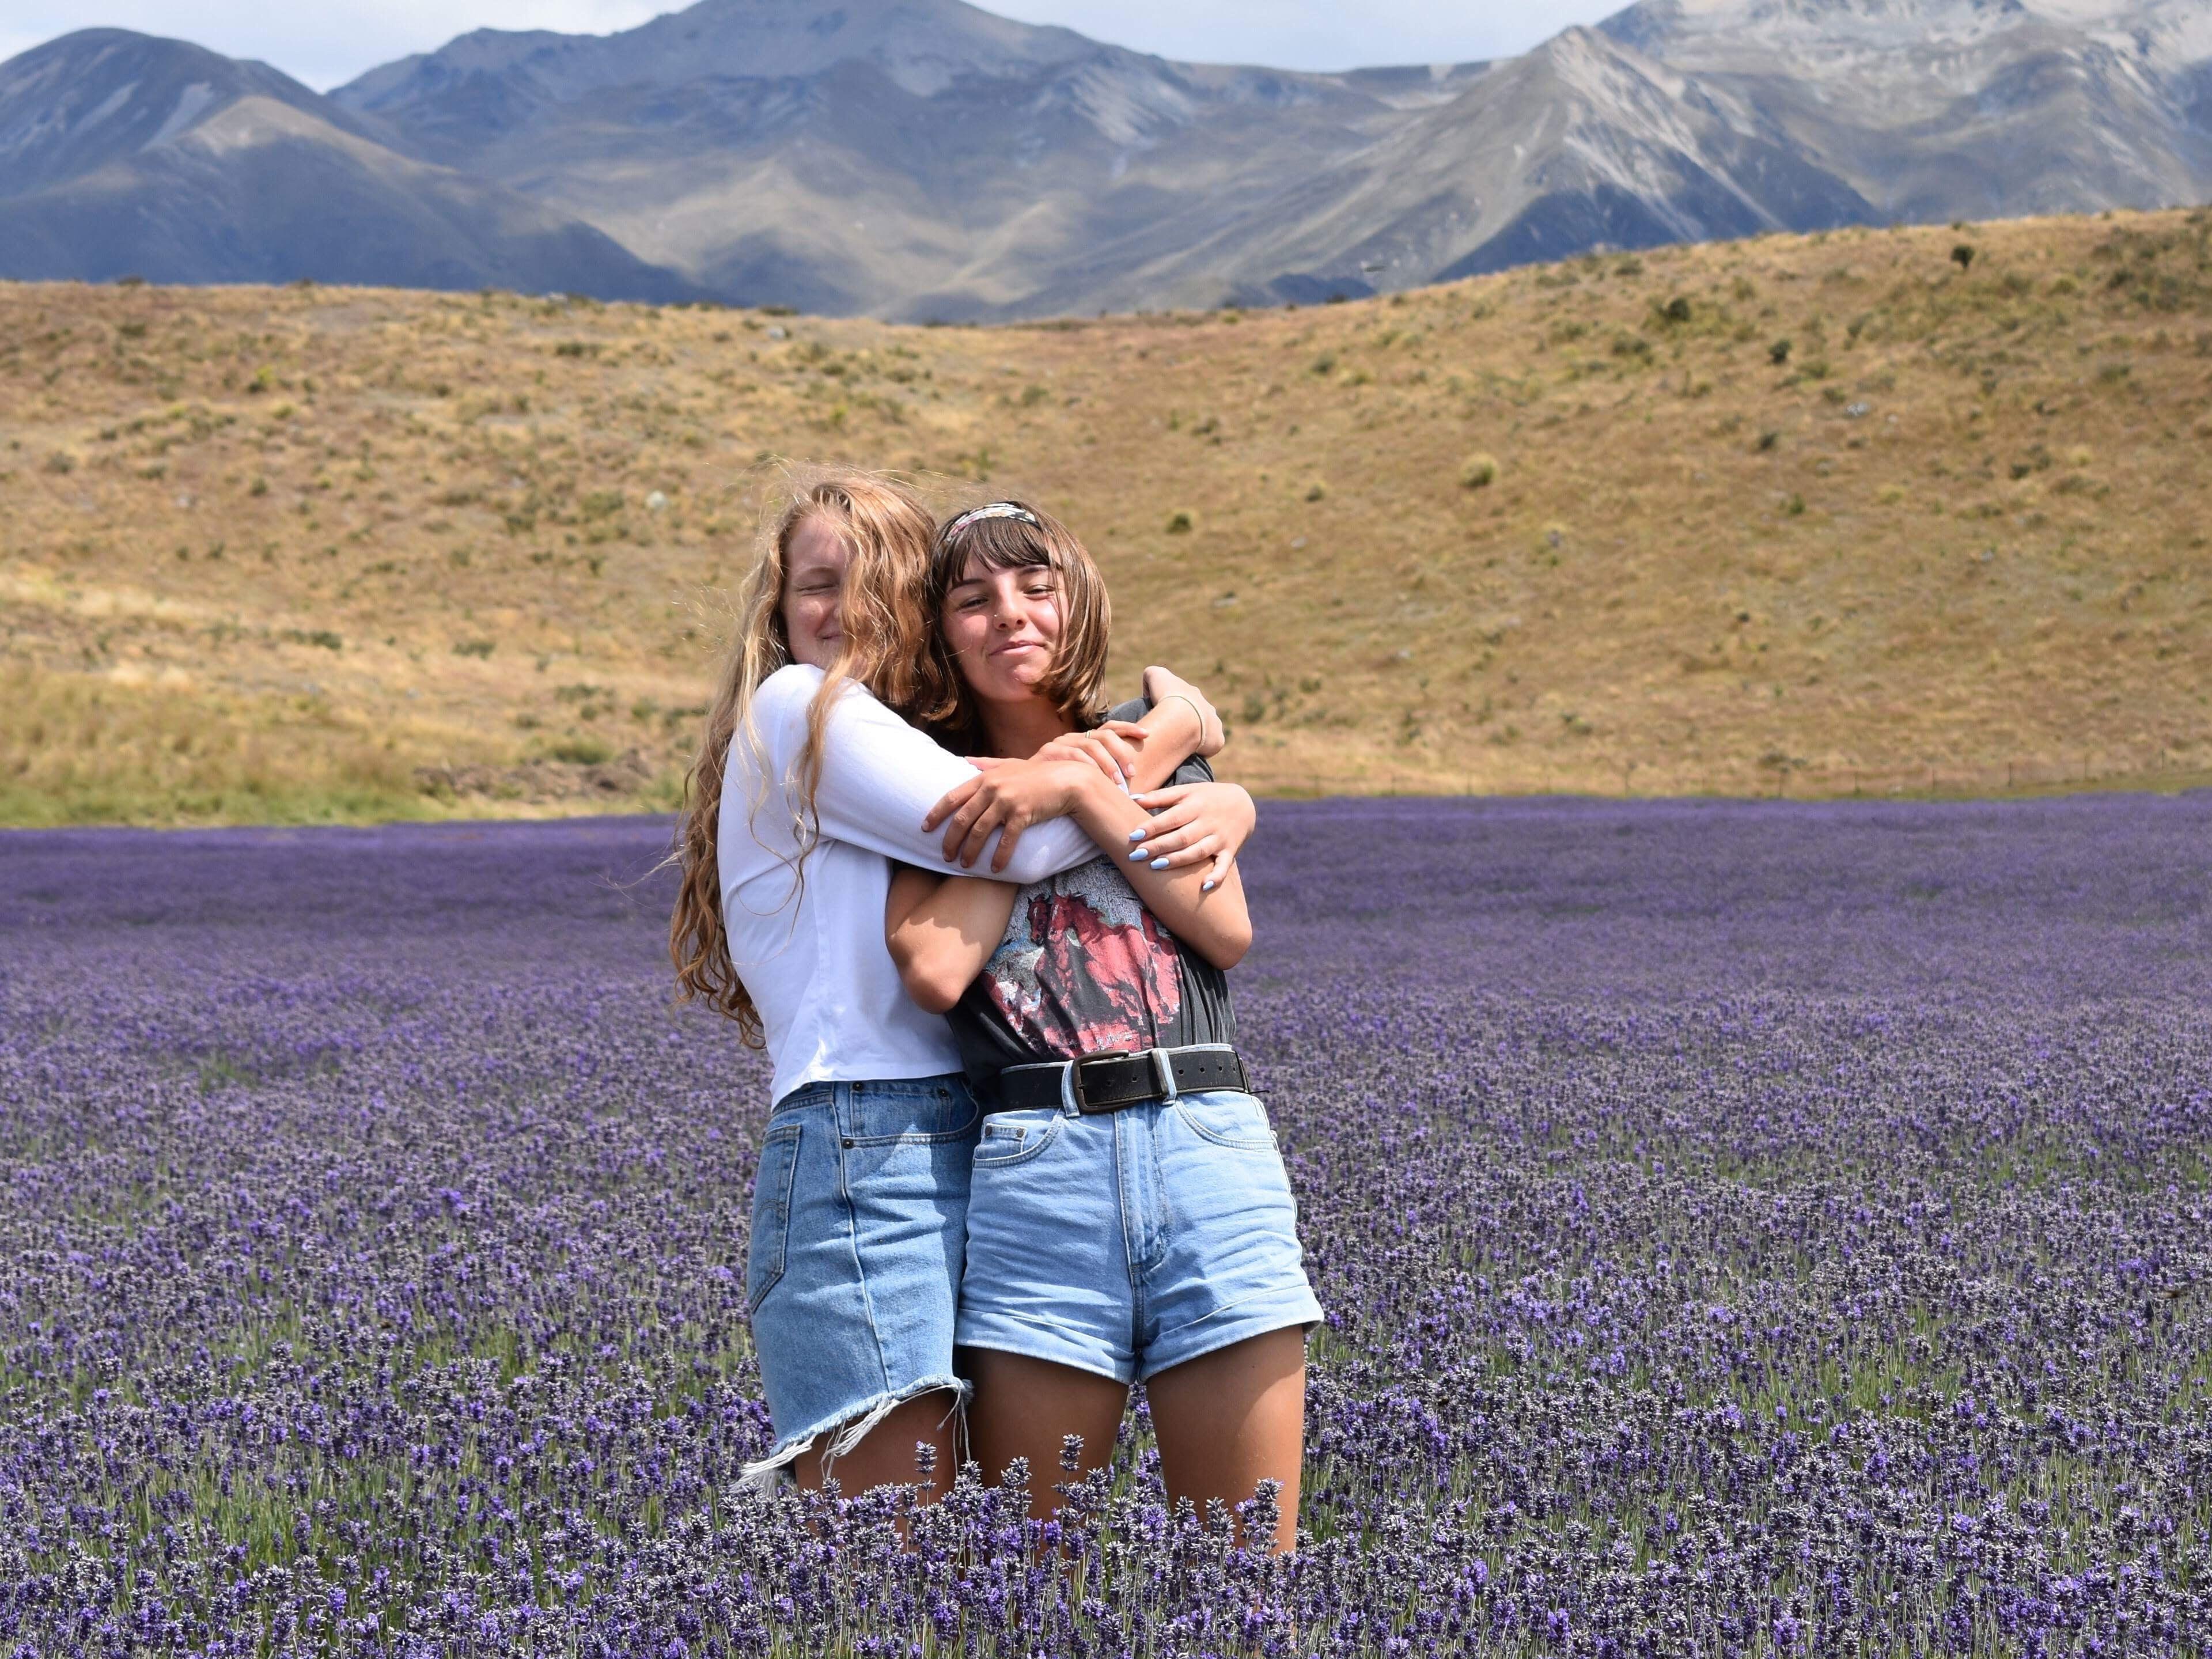 woman hugging another woman on purple flower field